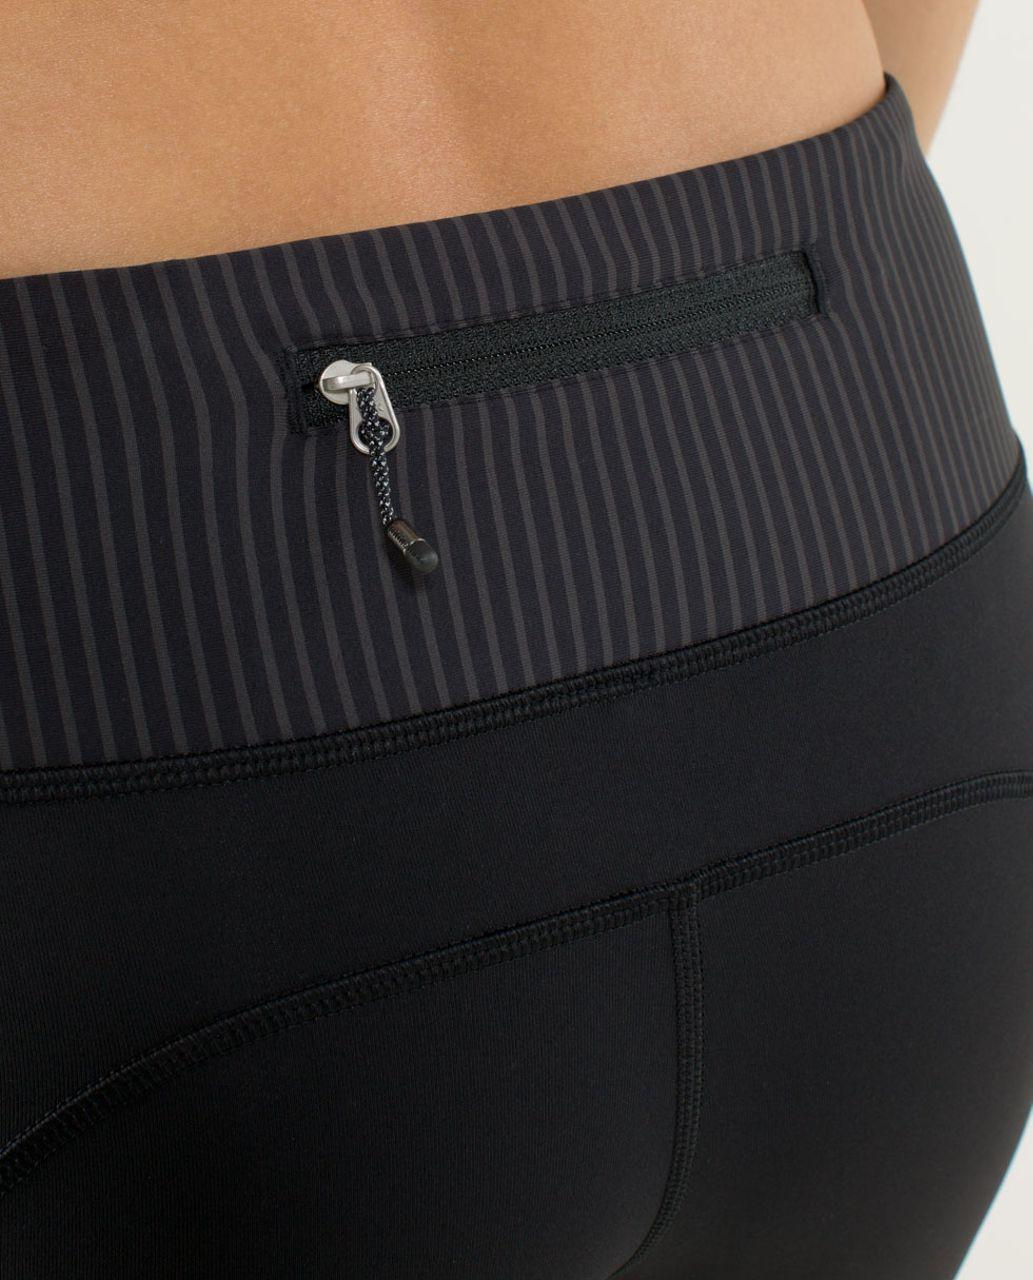 Lululemon Speed Tight *Cozy - Black / Hyper Stripe Black